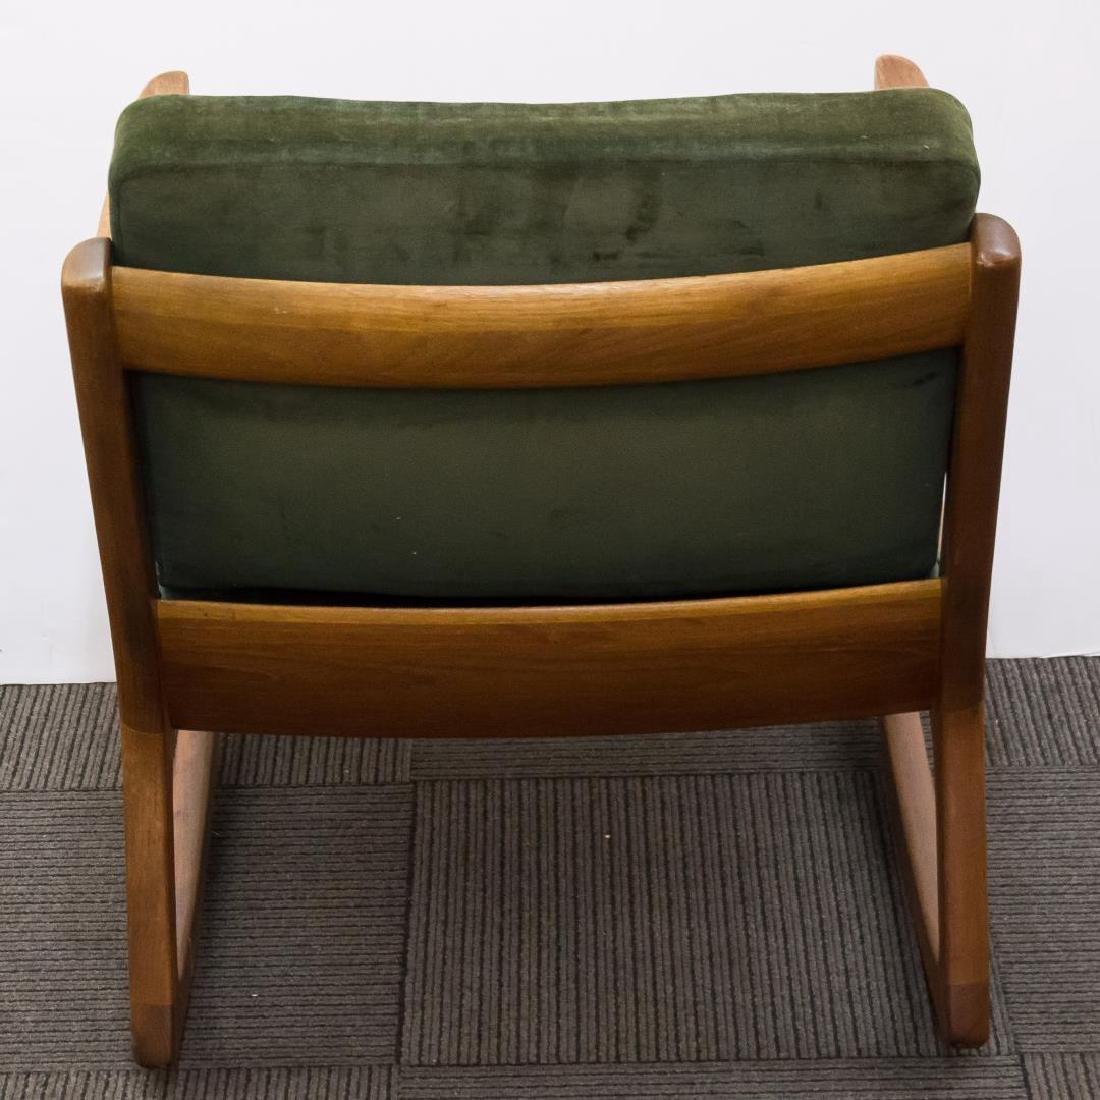 Ole Wanscher Danish Modern Teakwood Rocking Chair - 4